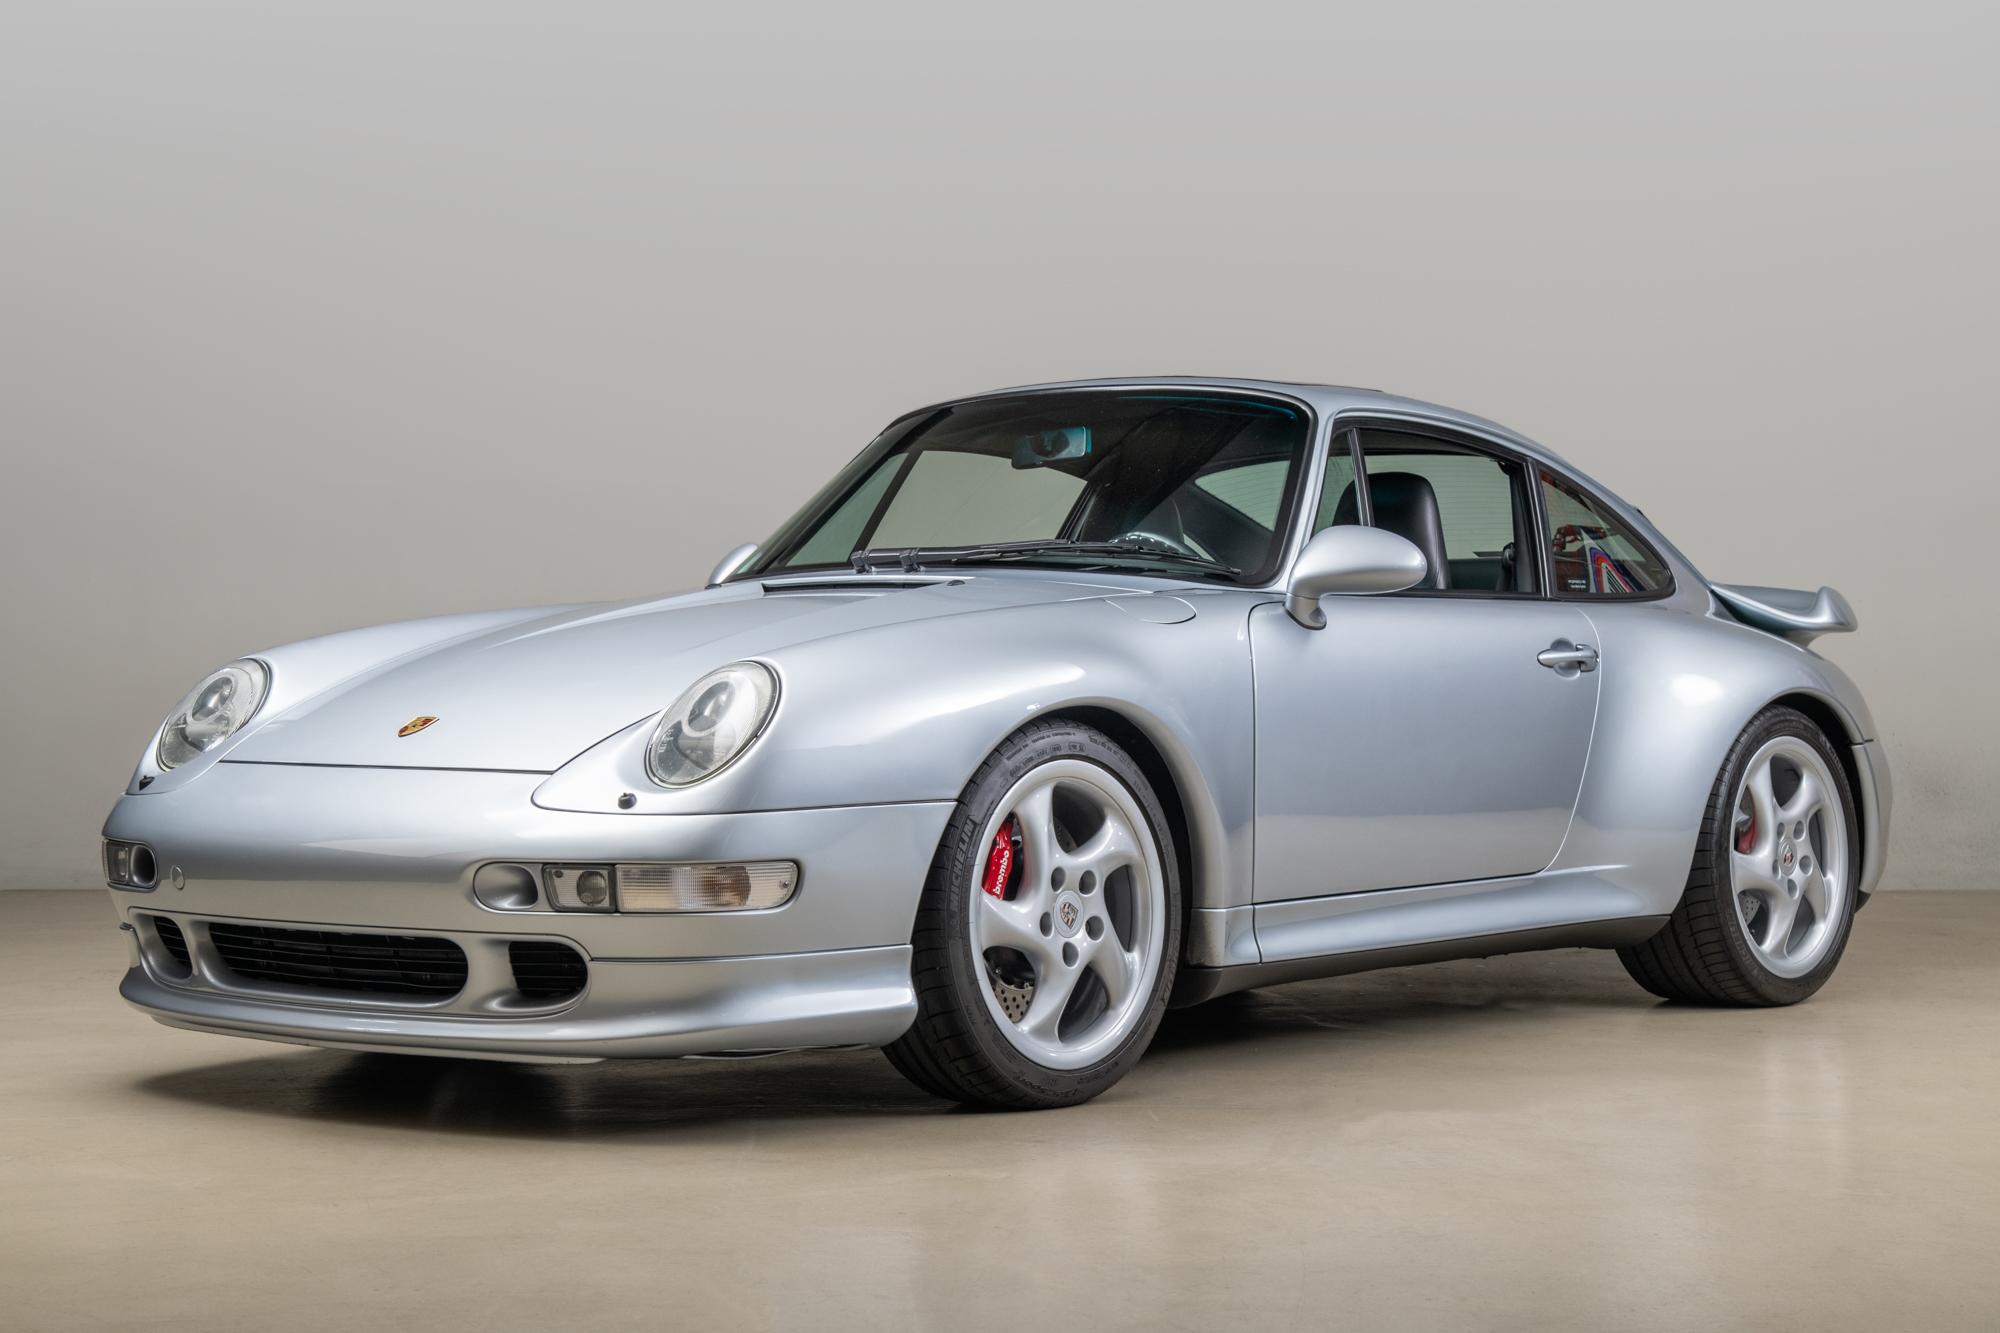 1996 Porsche 993 Turbo _6537